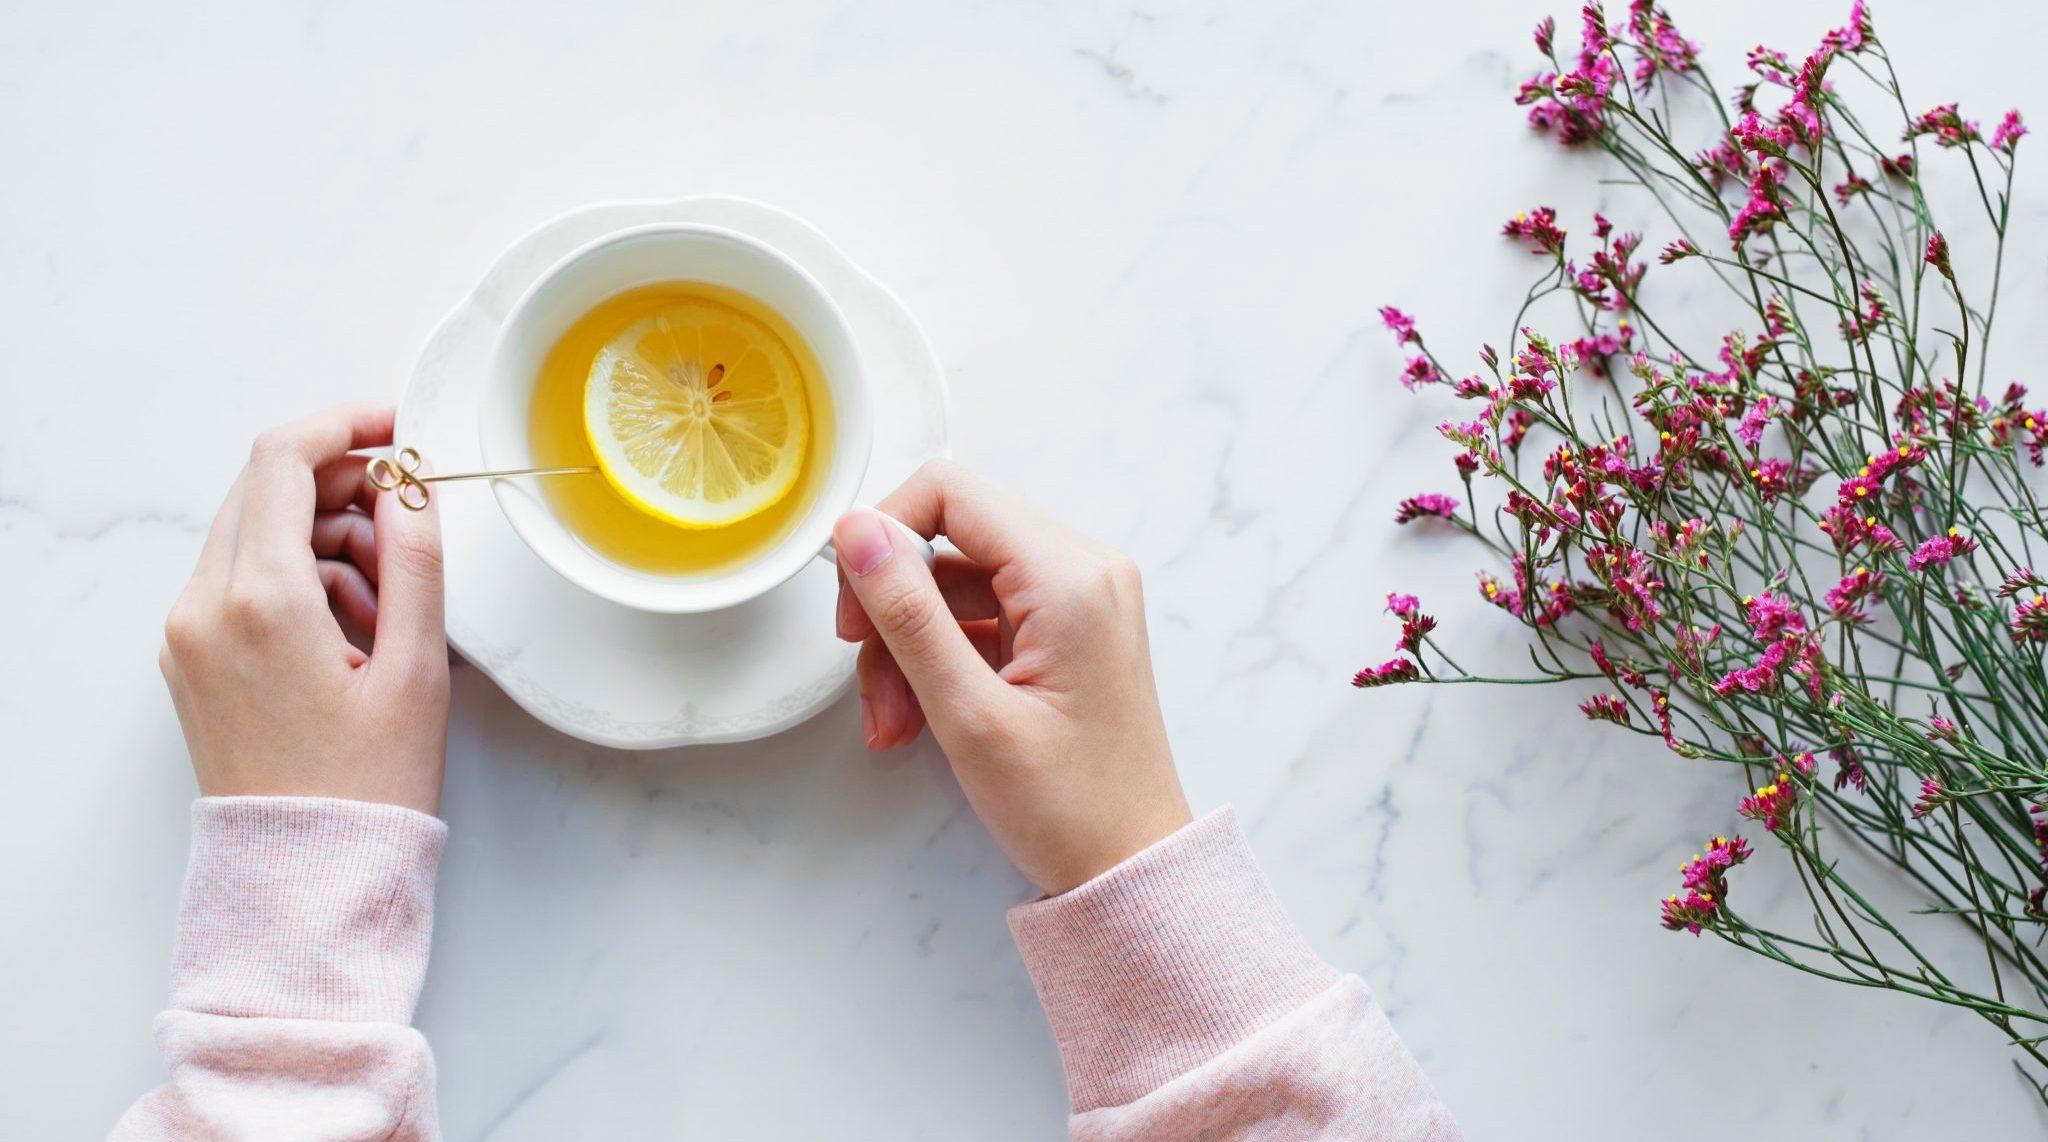 3. Experiencias Love de comida en mindfulness -min